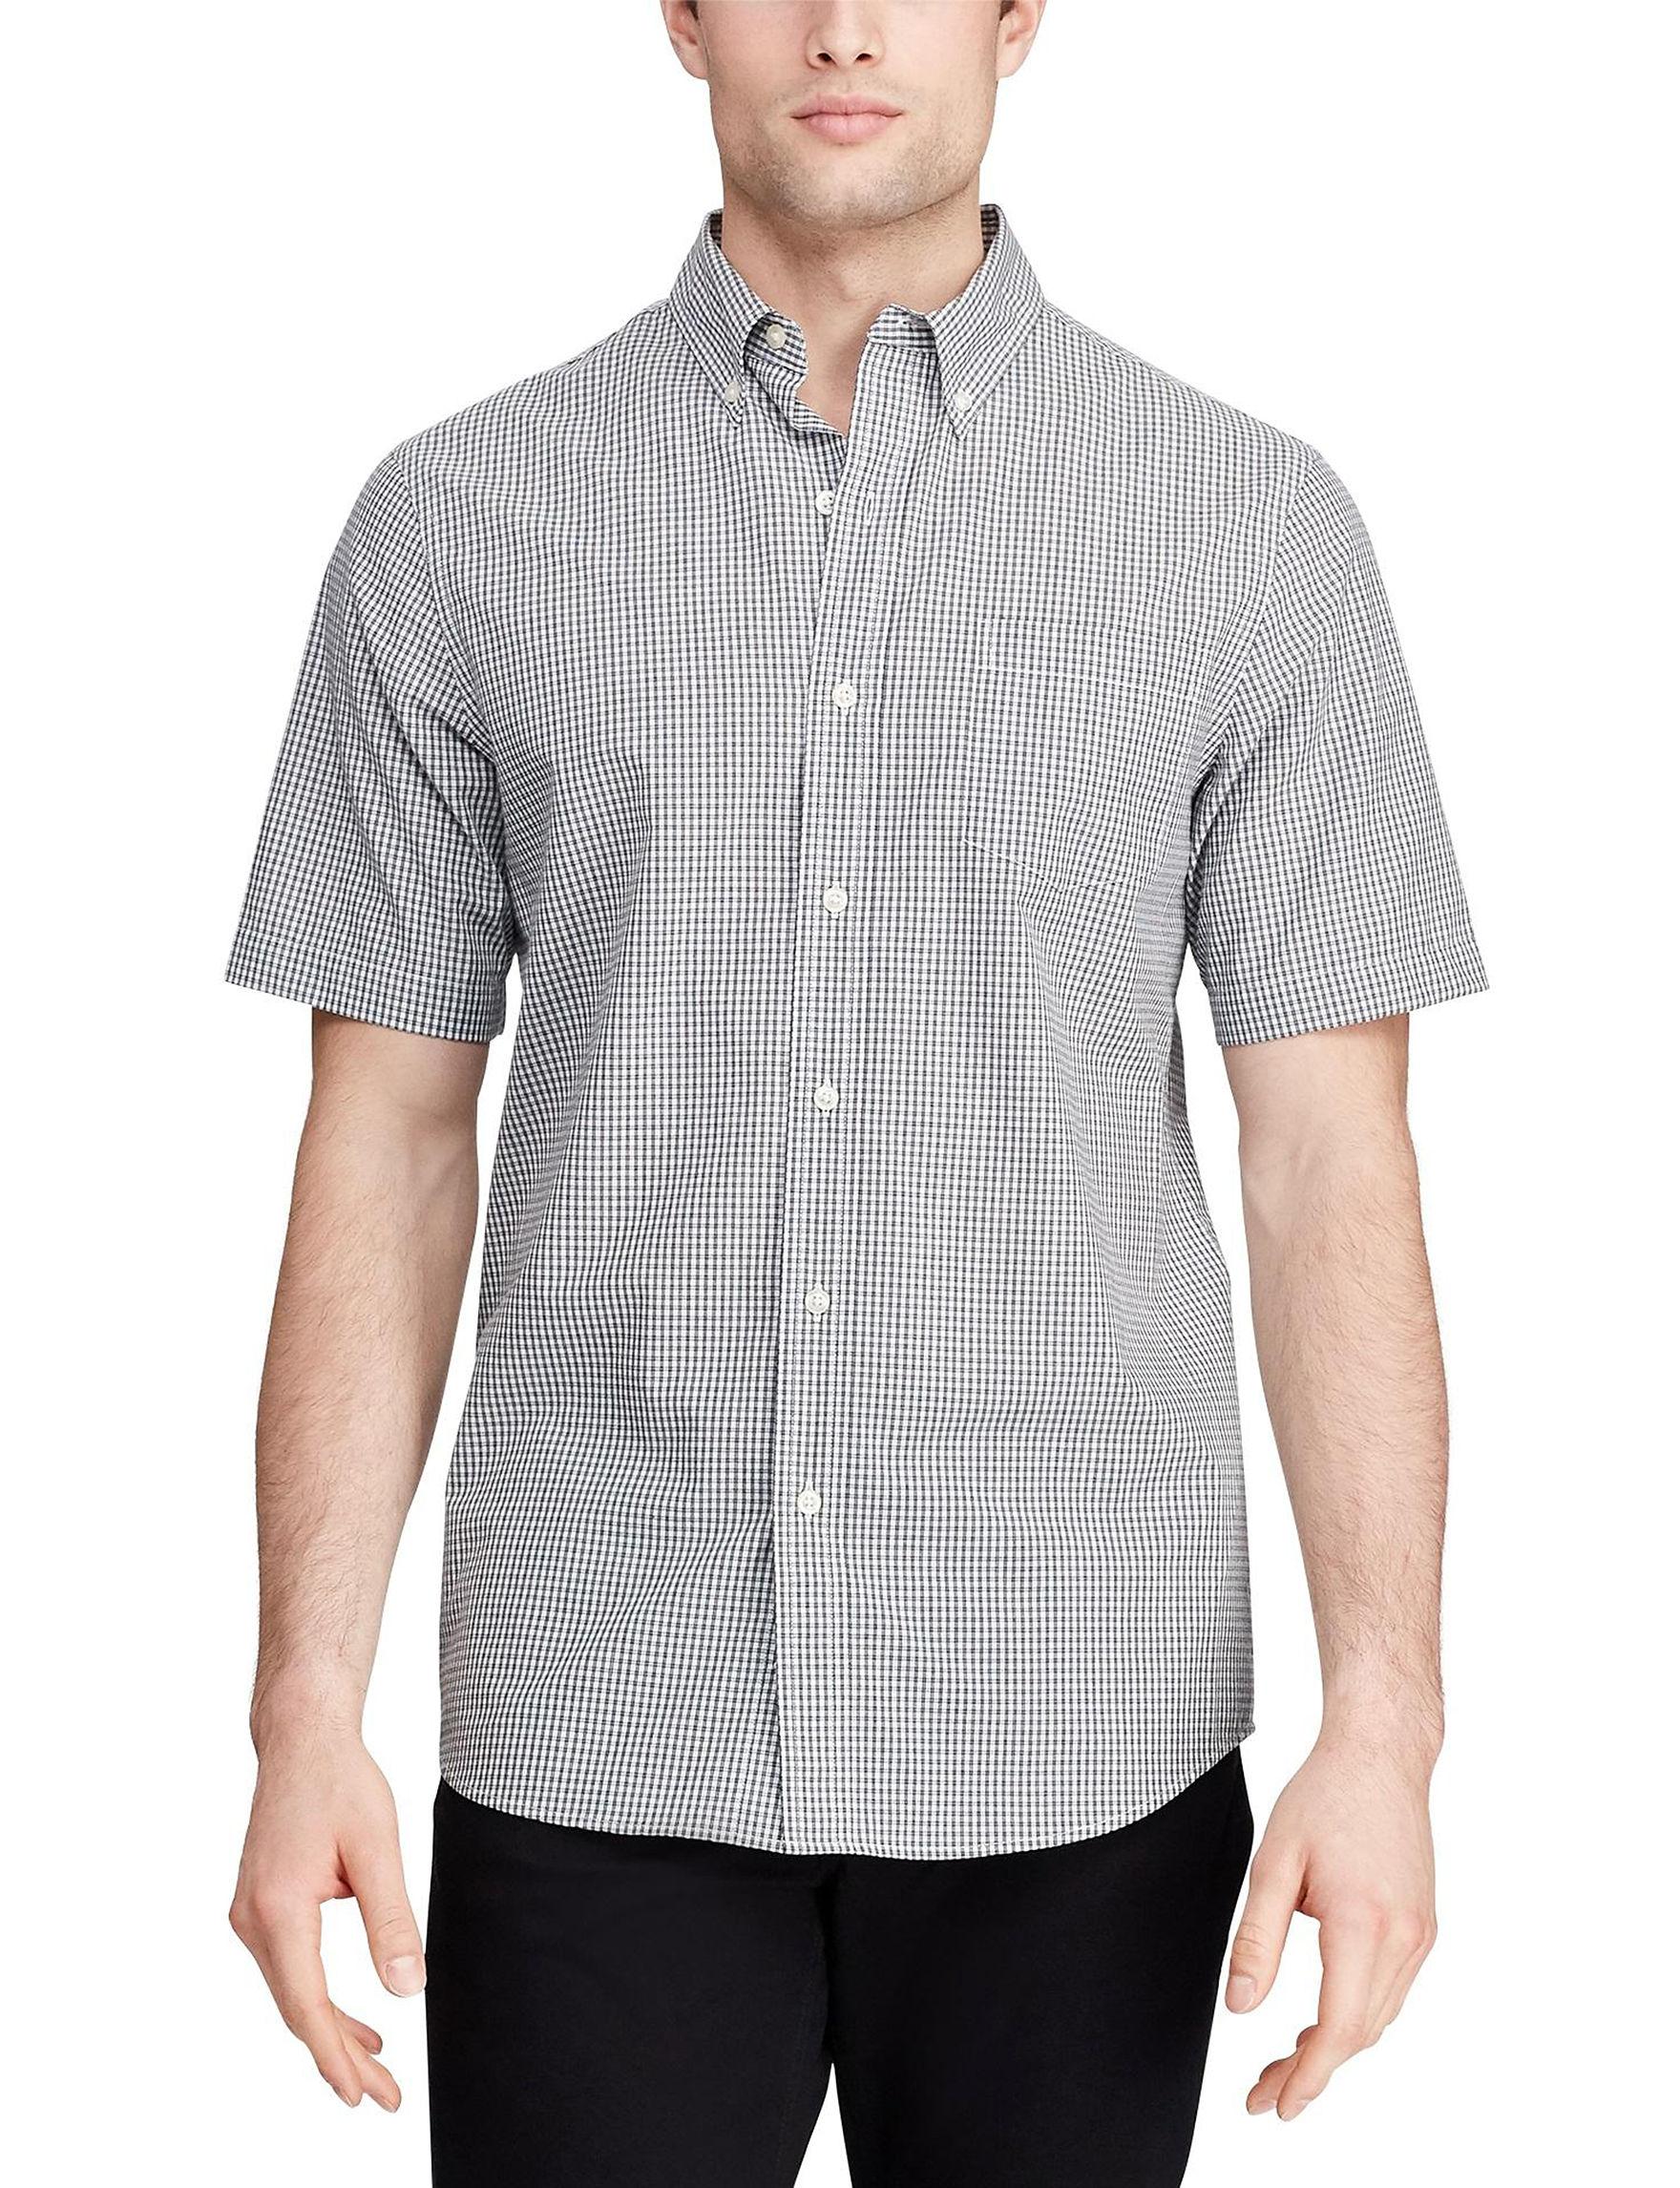 Chaps White / Multi Casual Button Down Shirts